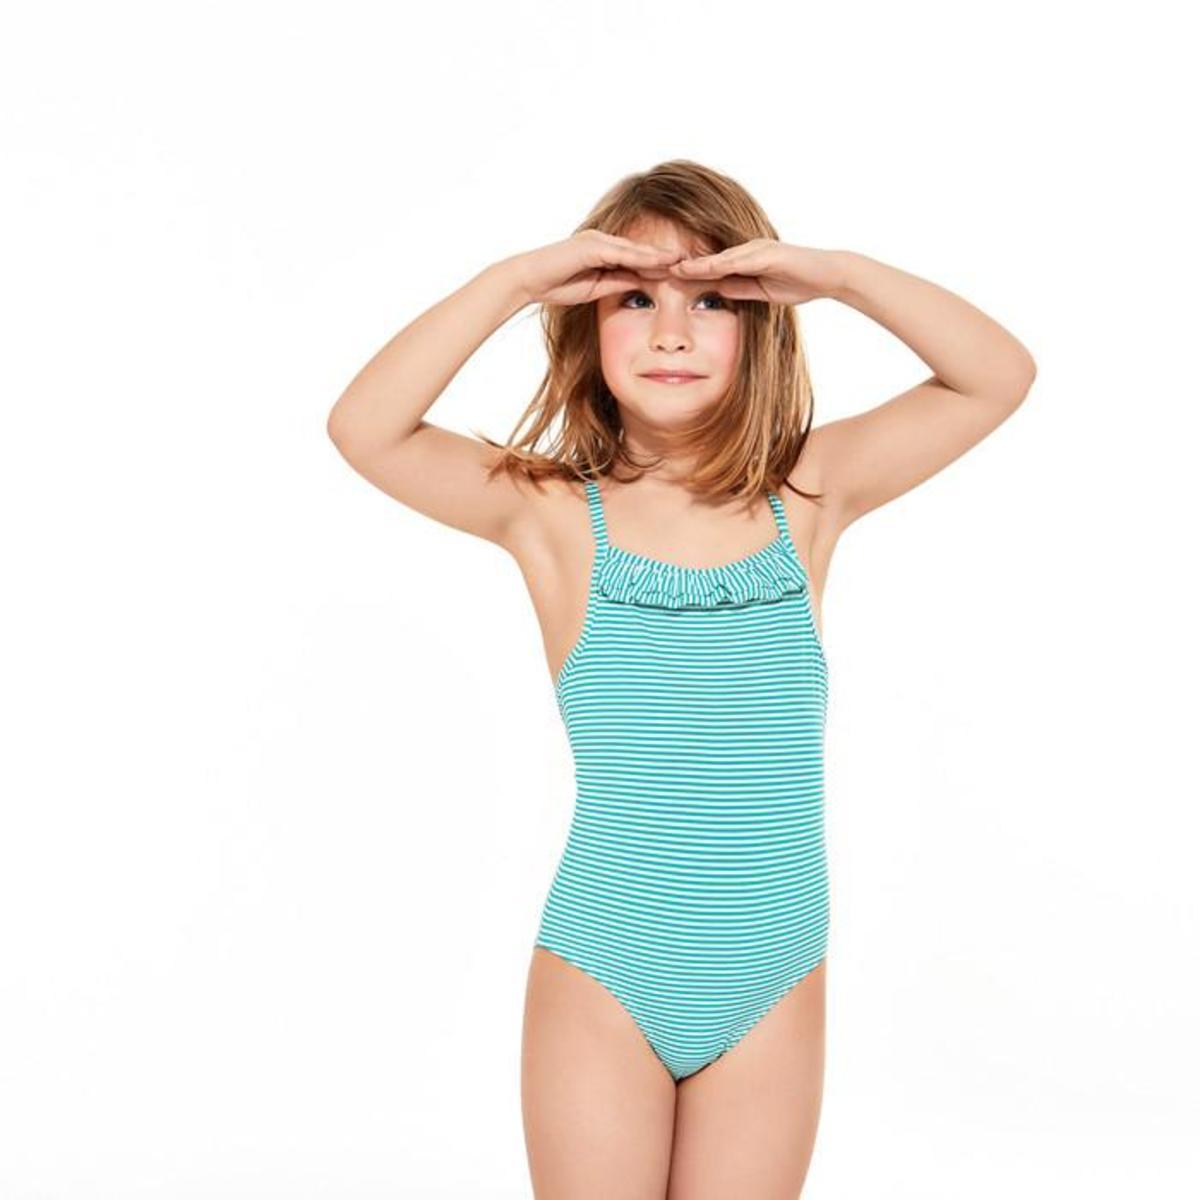 ecc3db95fa KIDS Petit Bateau Fini One Piece Swimsuit - Green White Stripes ...